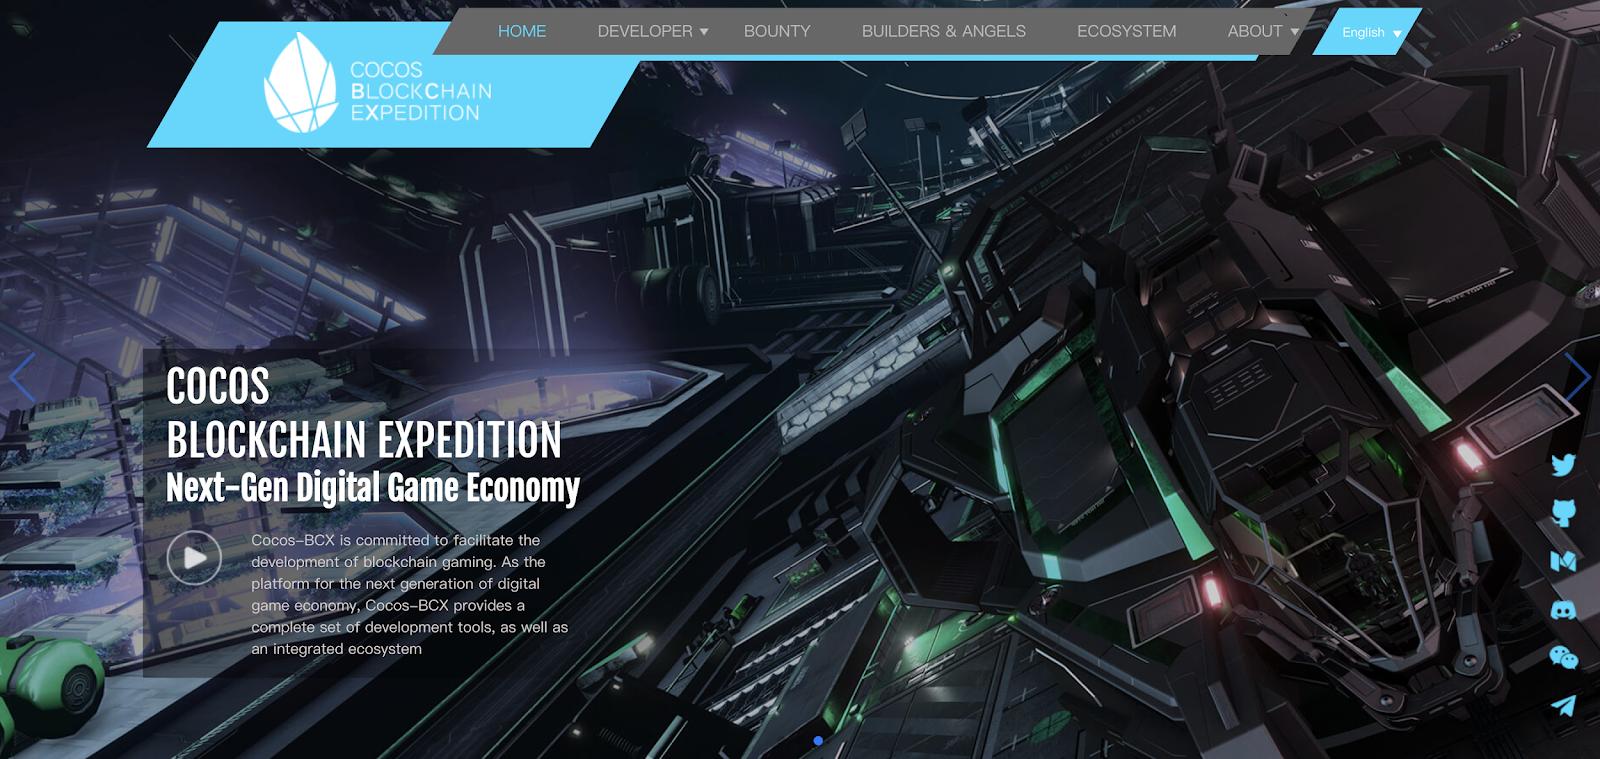 Taxa Network And Cocos-BCX Fuel Blockchain Game Development